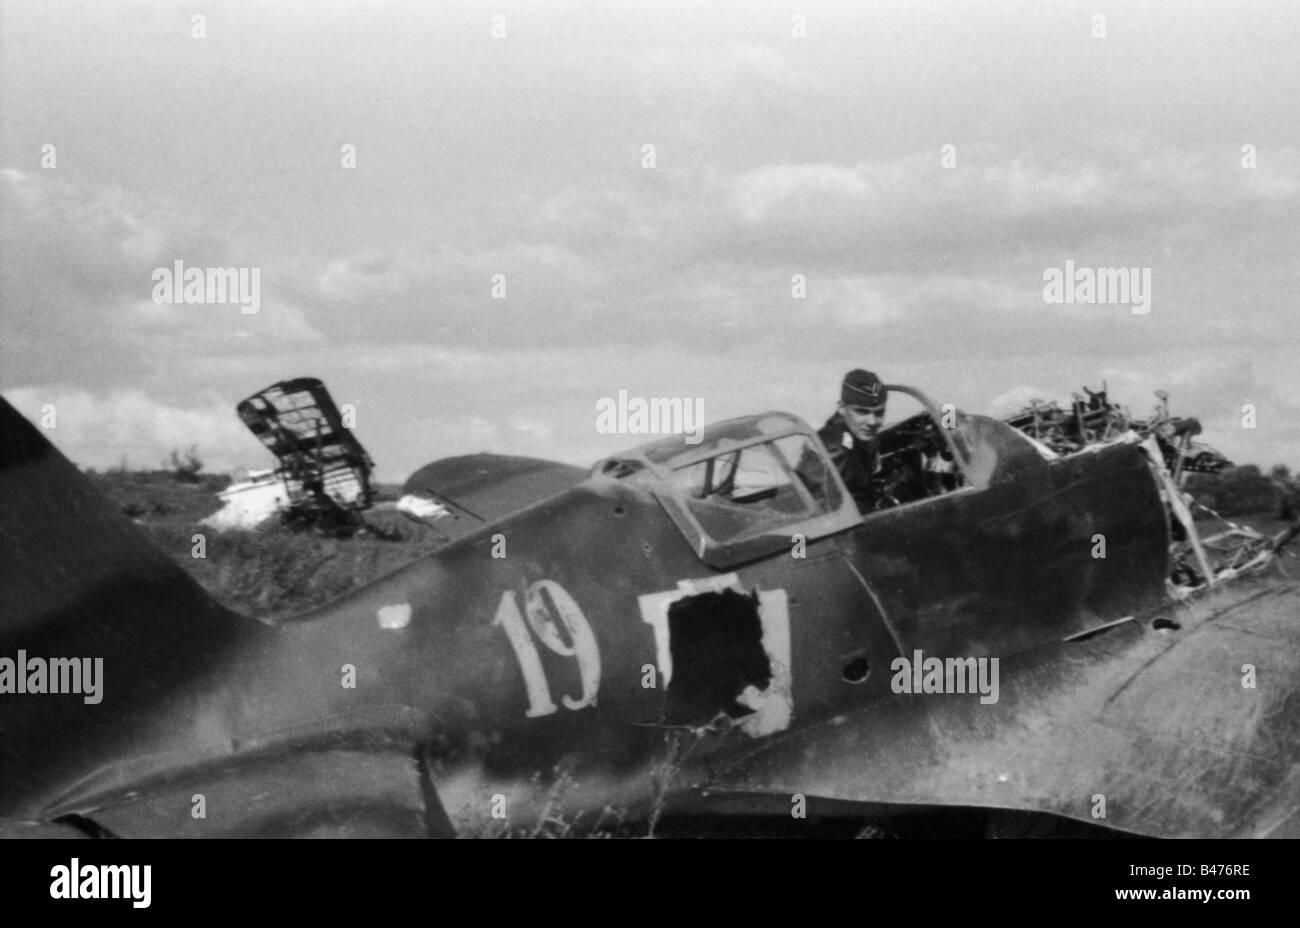 events, Second World War / WWII, aerial warfare, aircraft, crashed / damaged, Luftwaffe pilot in the cockpit of a destroyed Soviet fighter aircraft, Vitebsk, Belarus, September 1941, Stock Photo